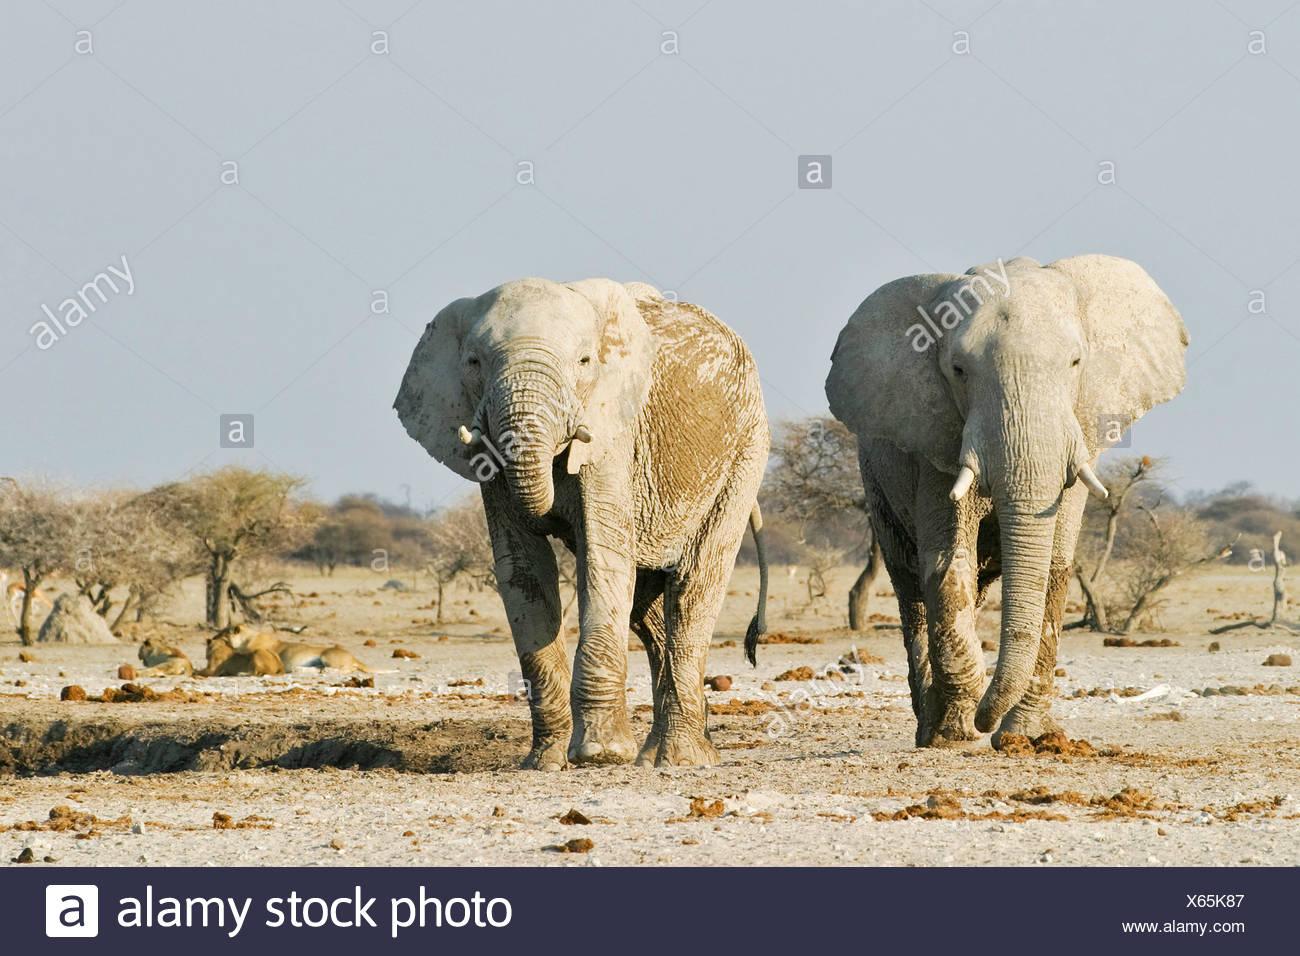 African Elephants (Loxodonta africana) and lions (Panthera leo) in the background, Nxai Pan, Makgadikgadi Pans National Park, B Stock Photo